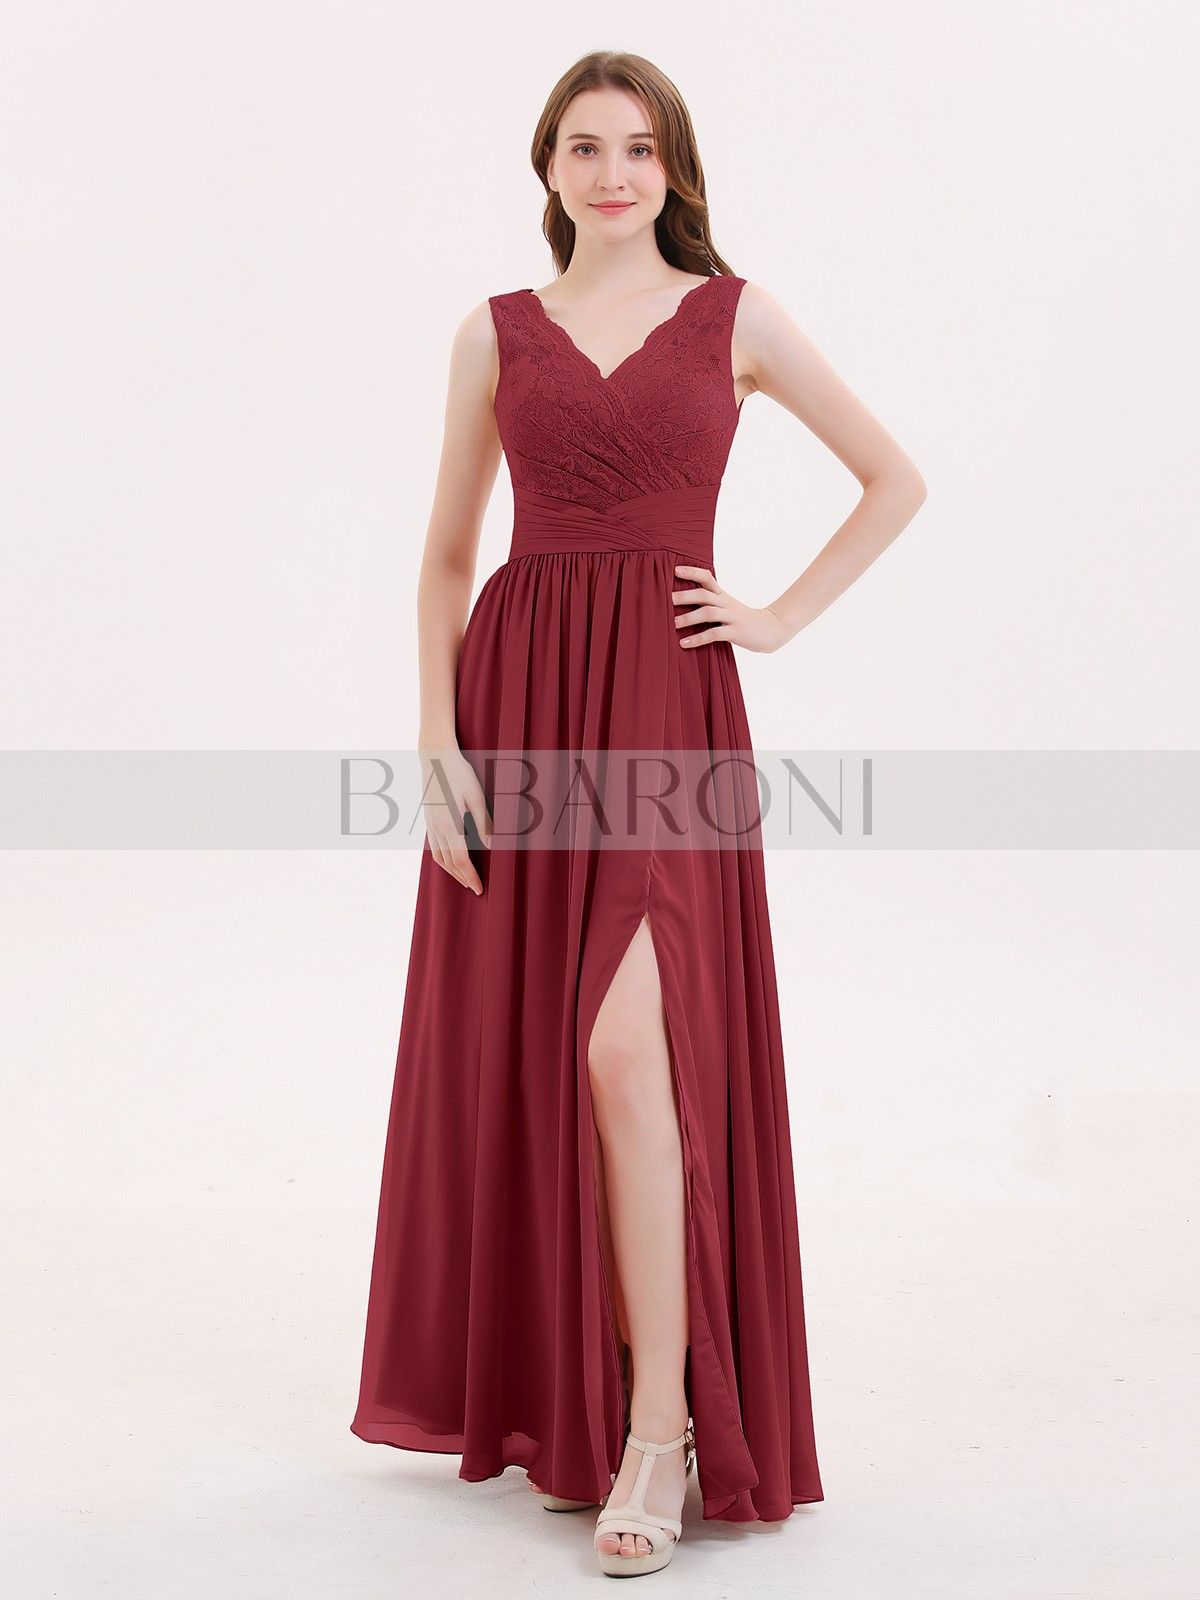 659e053b0e6 Burgundy Novia V Neck Chiffon And Lace Dress with Slit